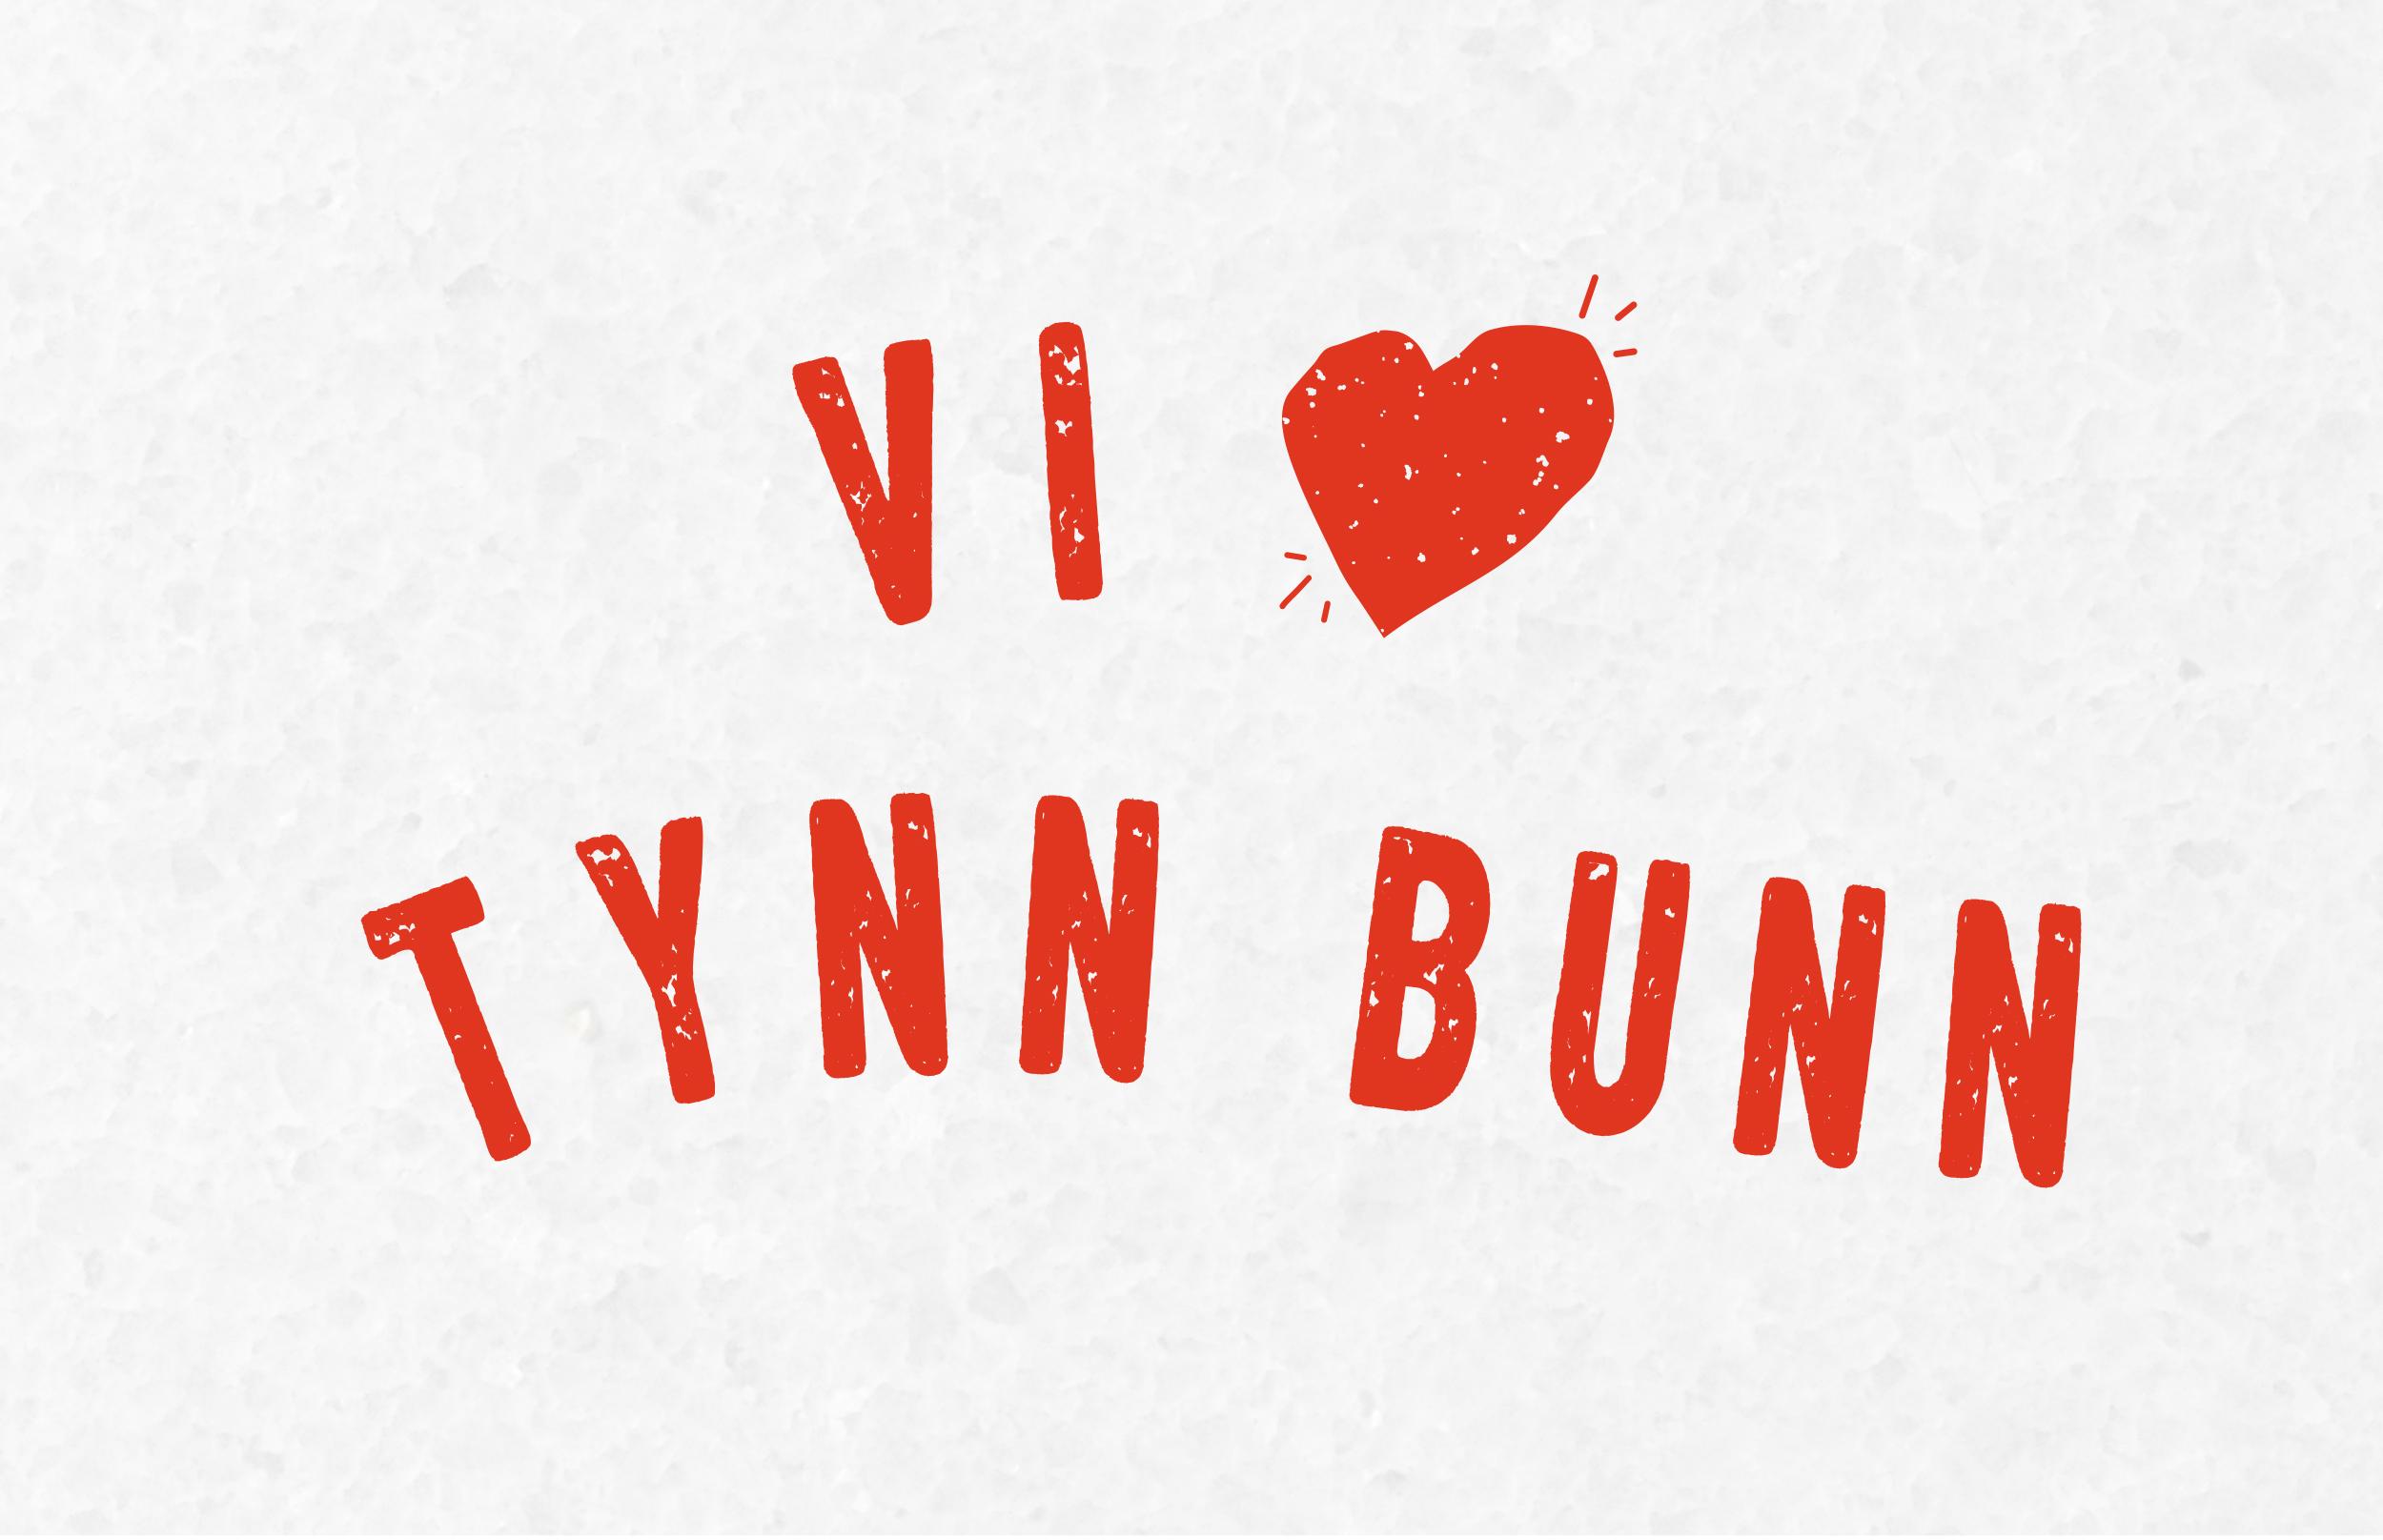 Grandiosa Tynn Bunn 23